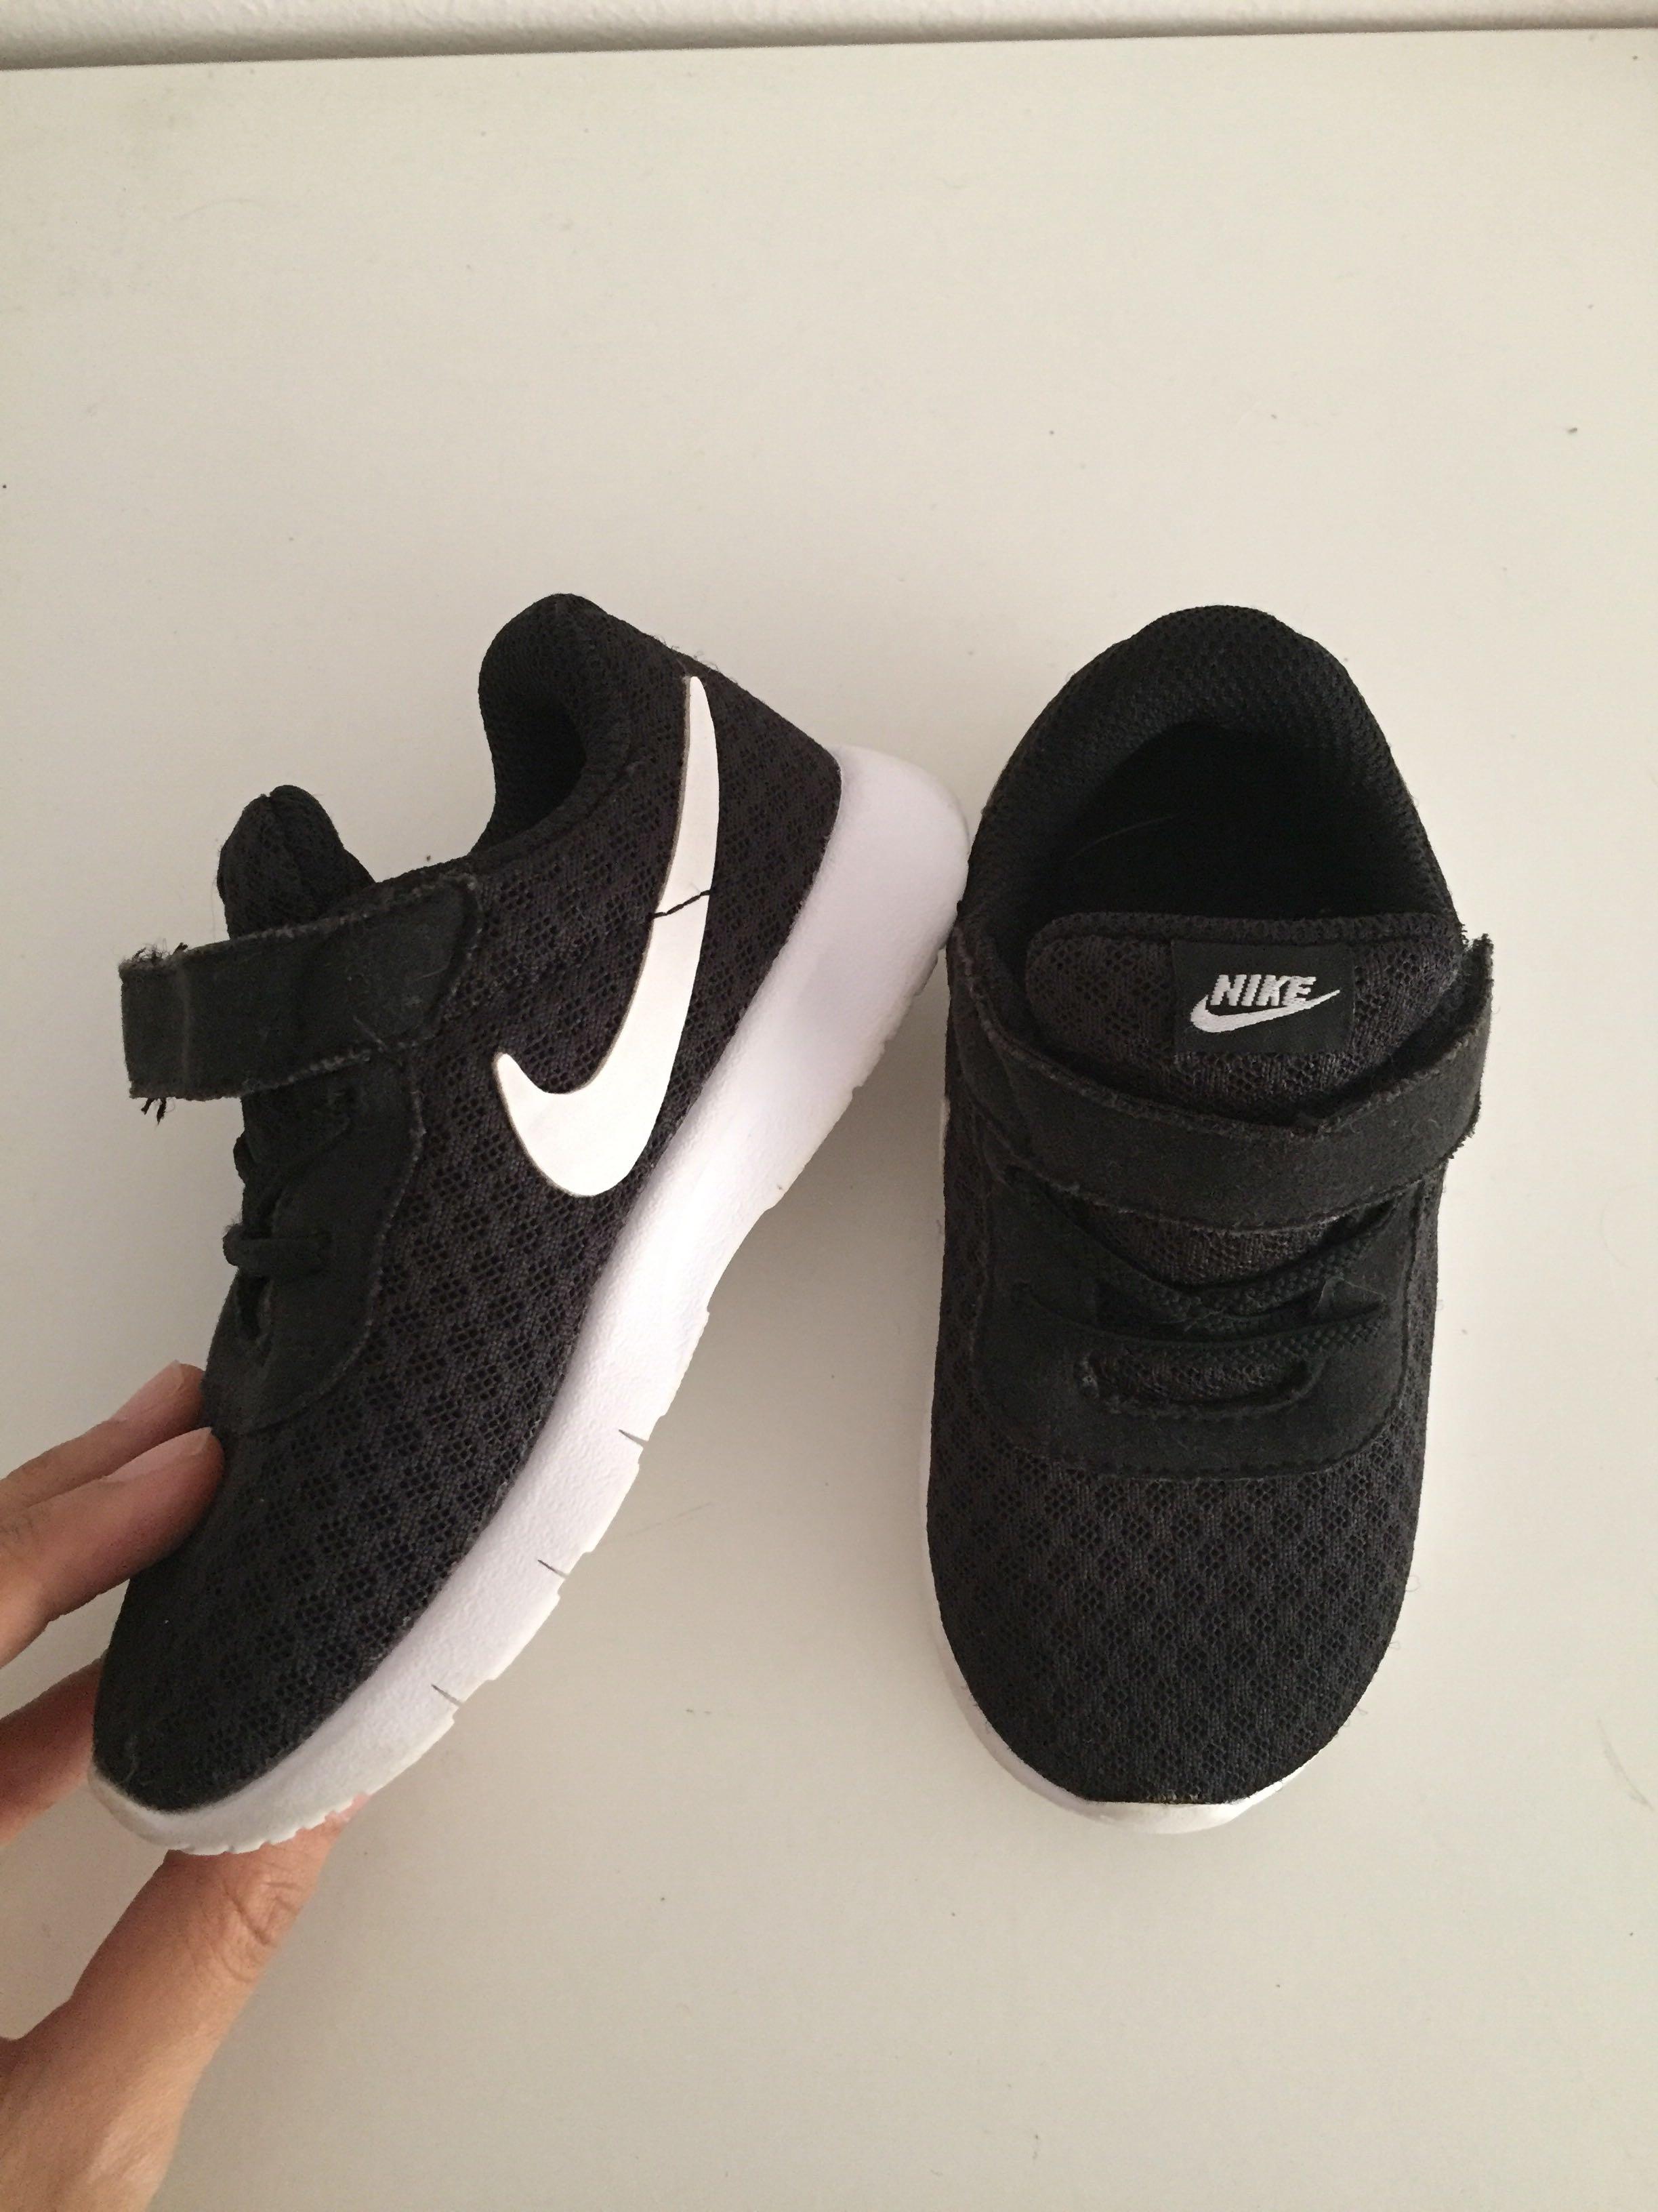 uk availability e628e 4a3ee Nike Tanjun (TDV) baby shoes, Babies   Kids, Babies Apparel on Carousell